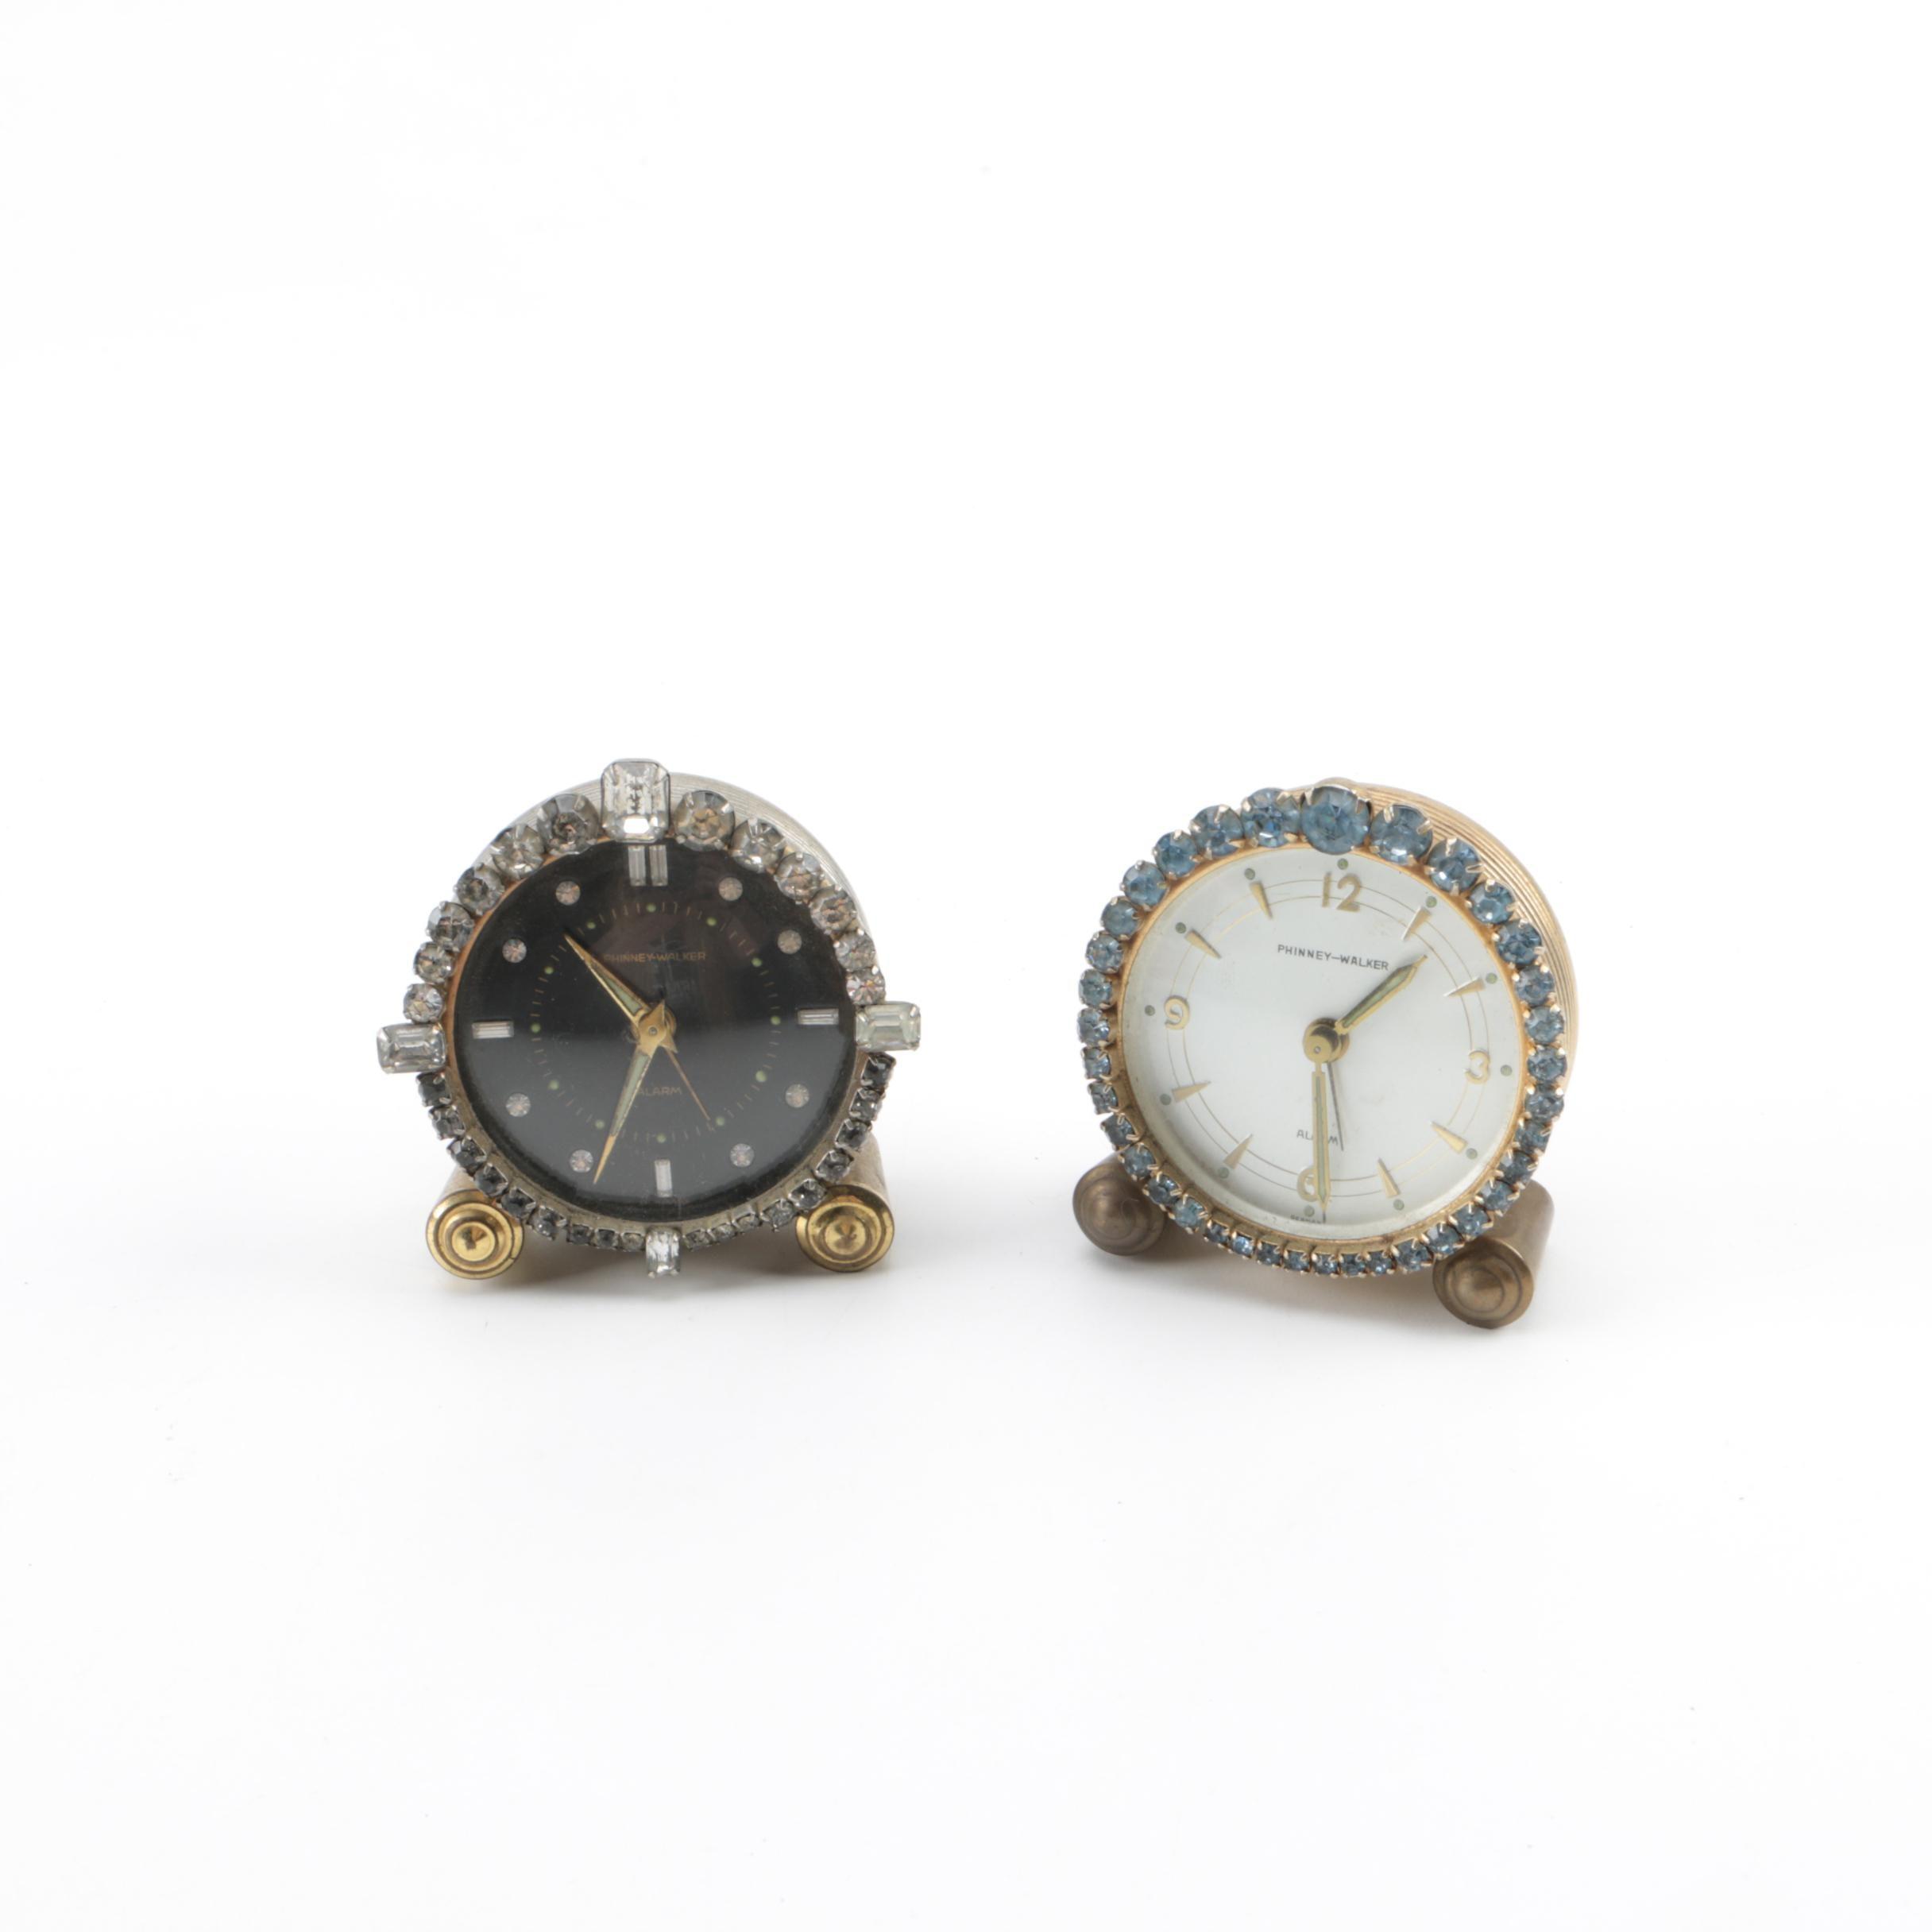 Pair of Phinney-Walker Table Clocks